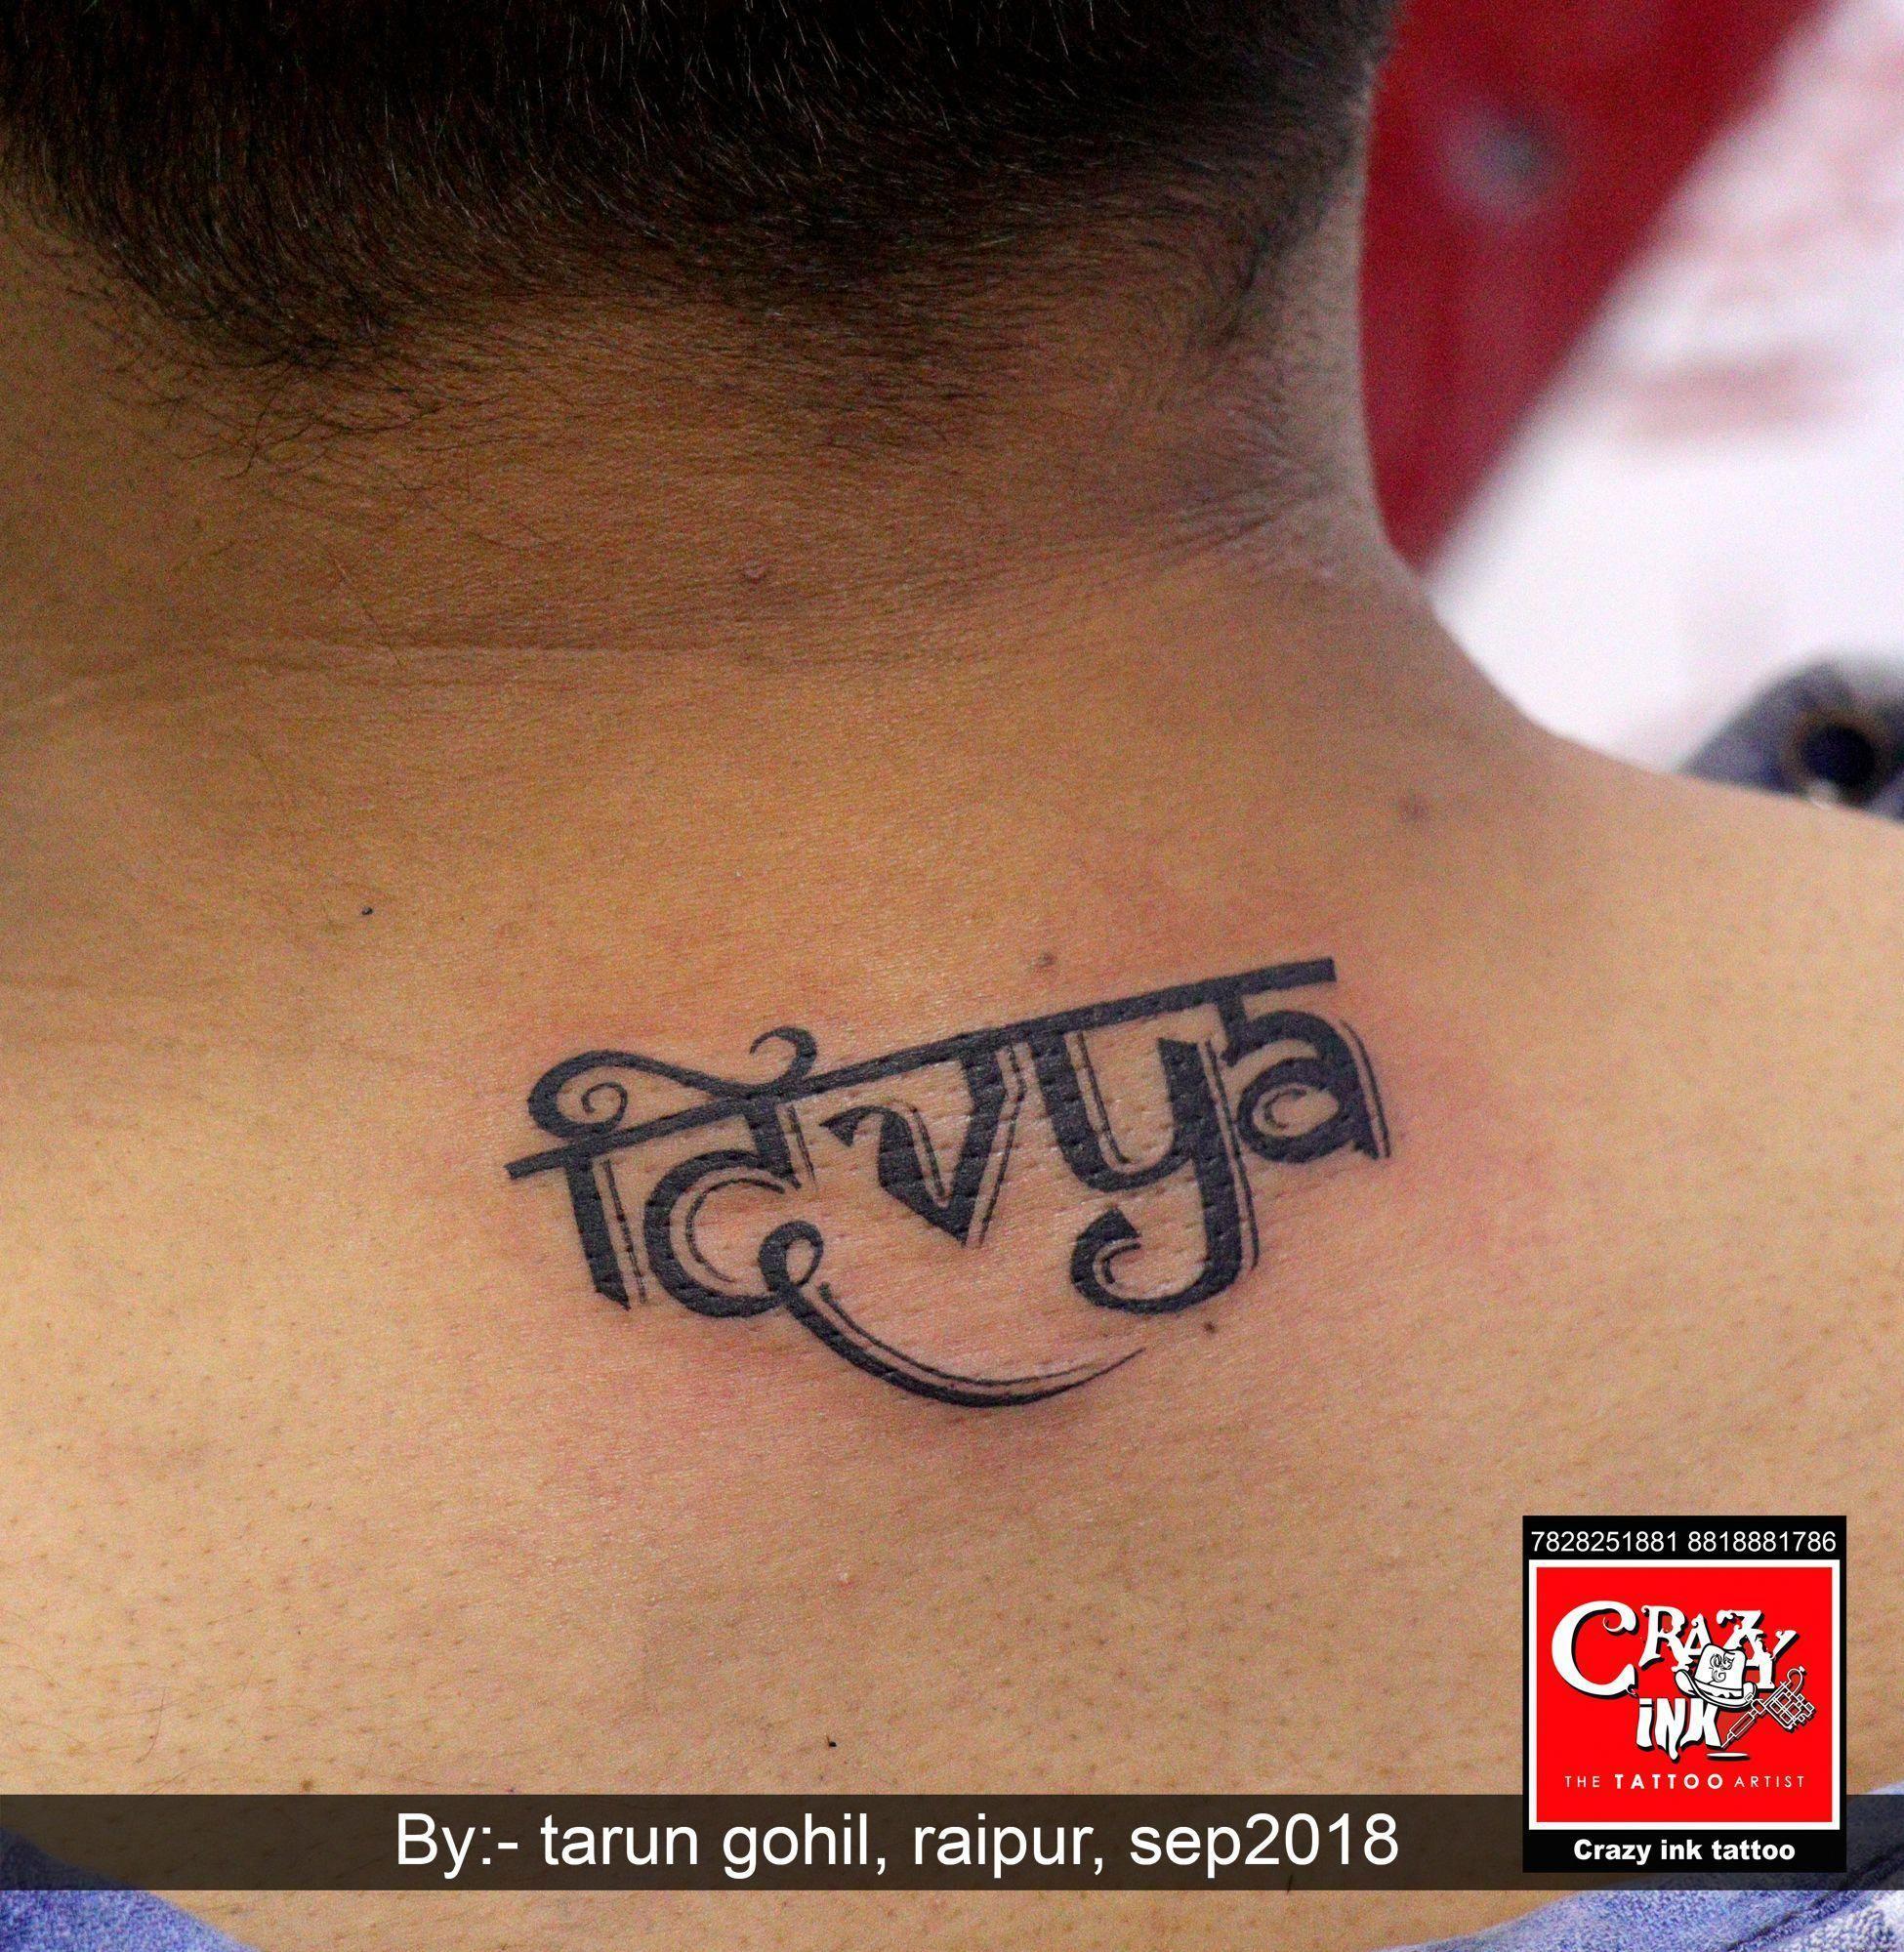 Divya Name Tattoo On Back Neck Side Done At Crazyink Tattoo Studio Raipur Divyatattoo Nametattoo Divya Name Tat In 2020 Back Tattoo Name Tattoos On Back Tattoos